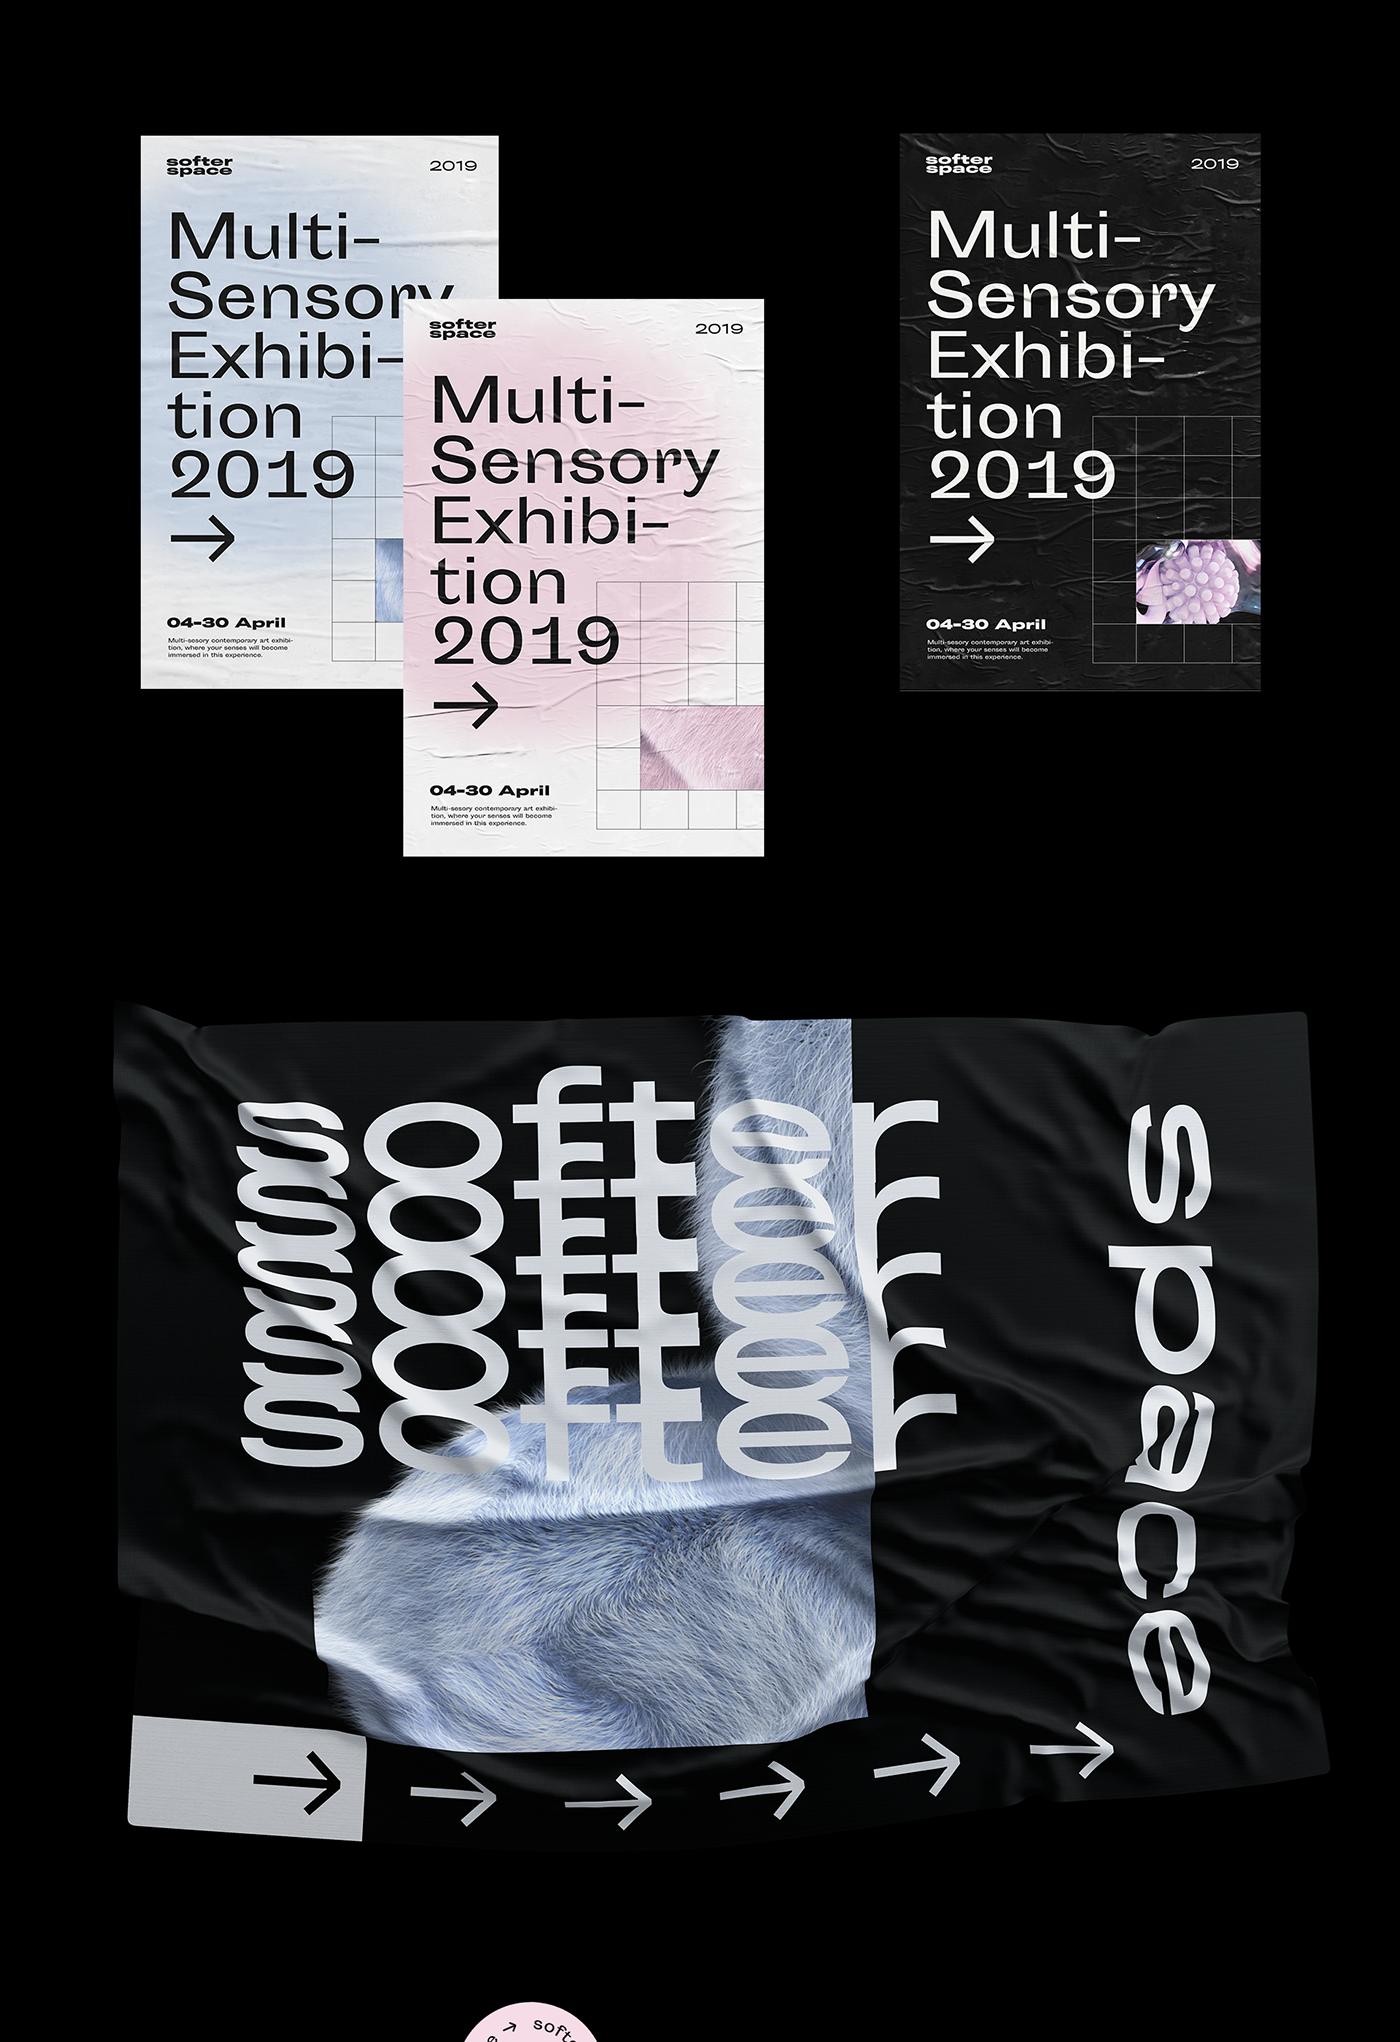 exhibit multi-sensory Spatial Design UI 3D asmr soft Experience SENSORY adobeawards